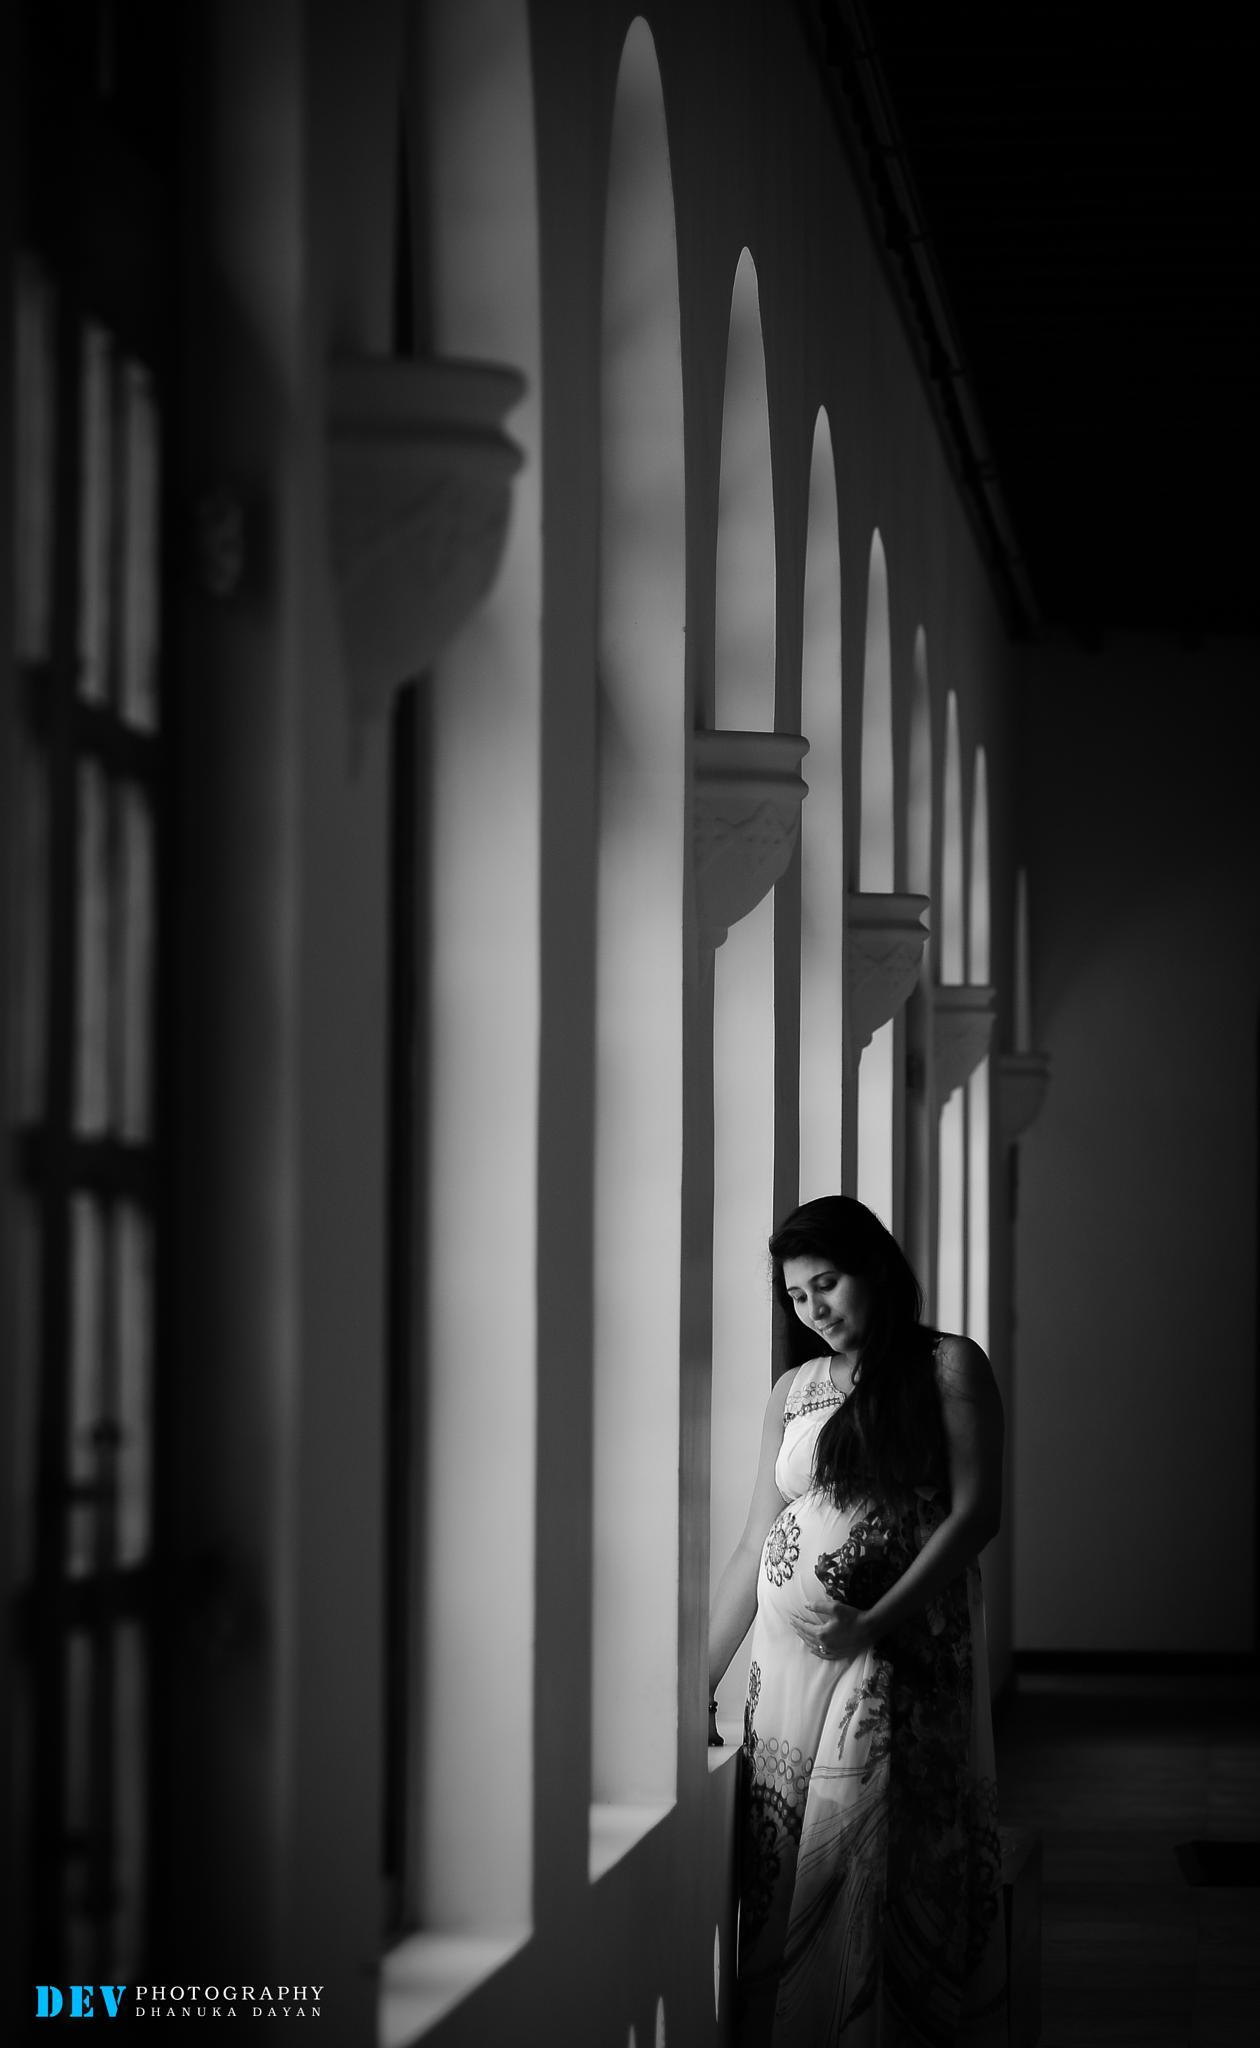 Untitled by Dev Dhanuka